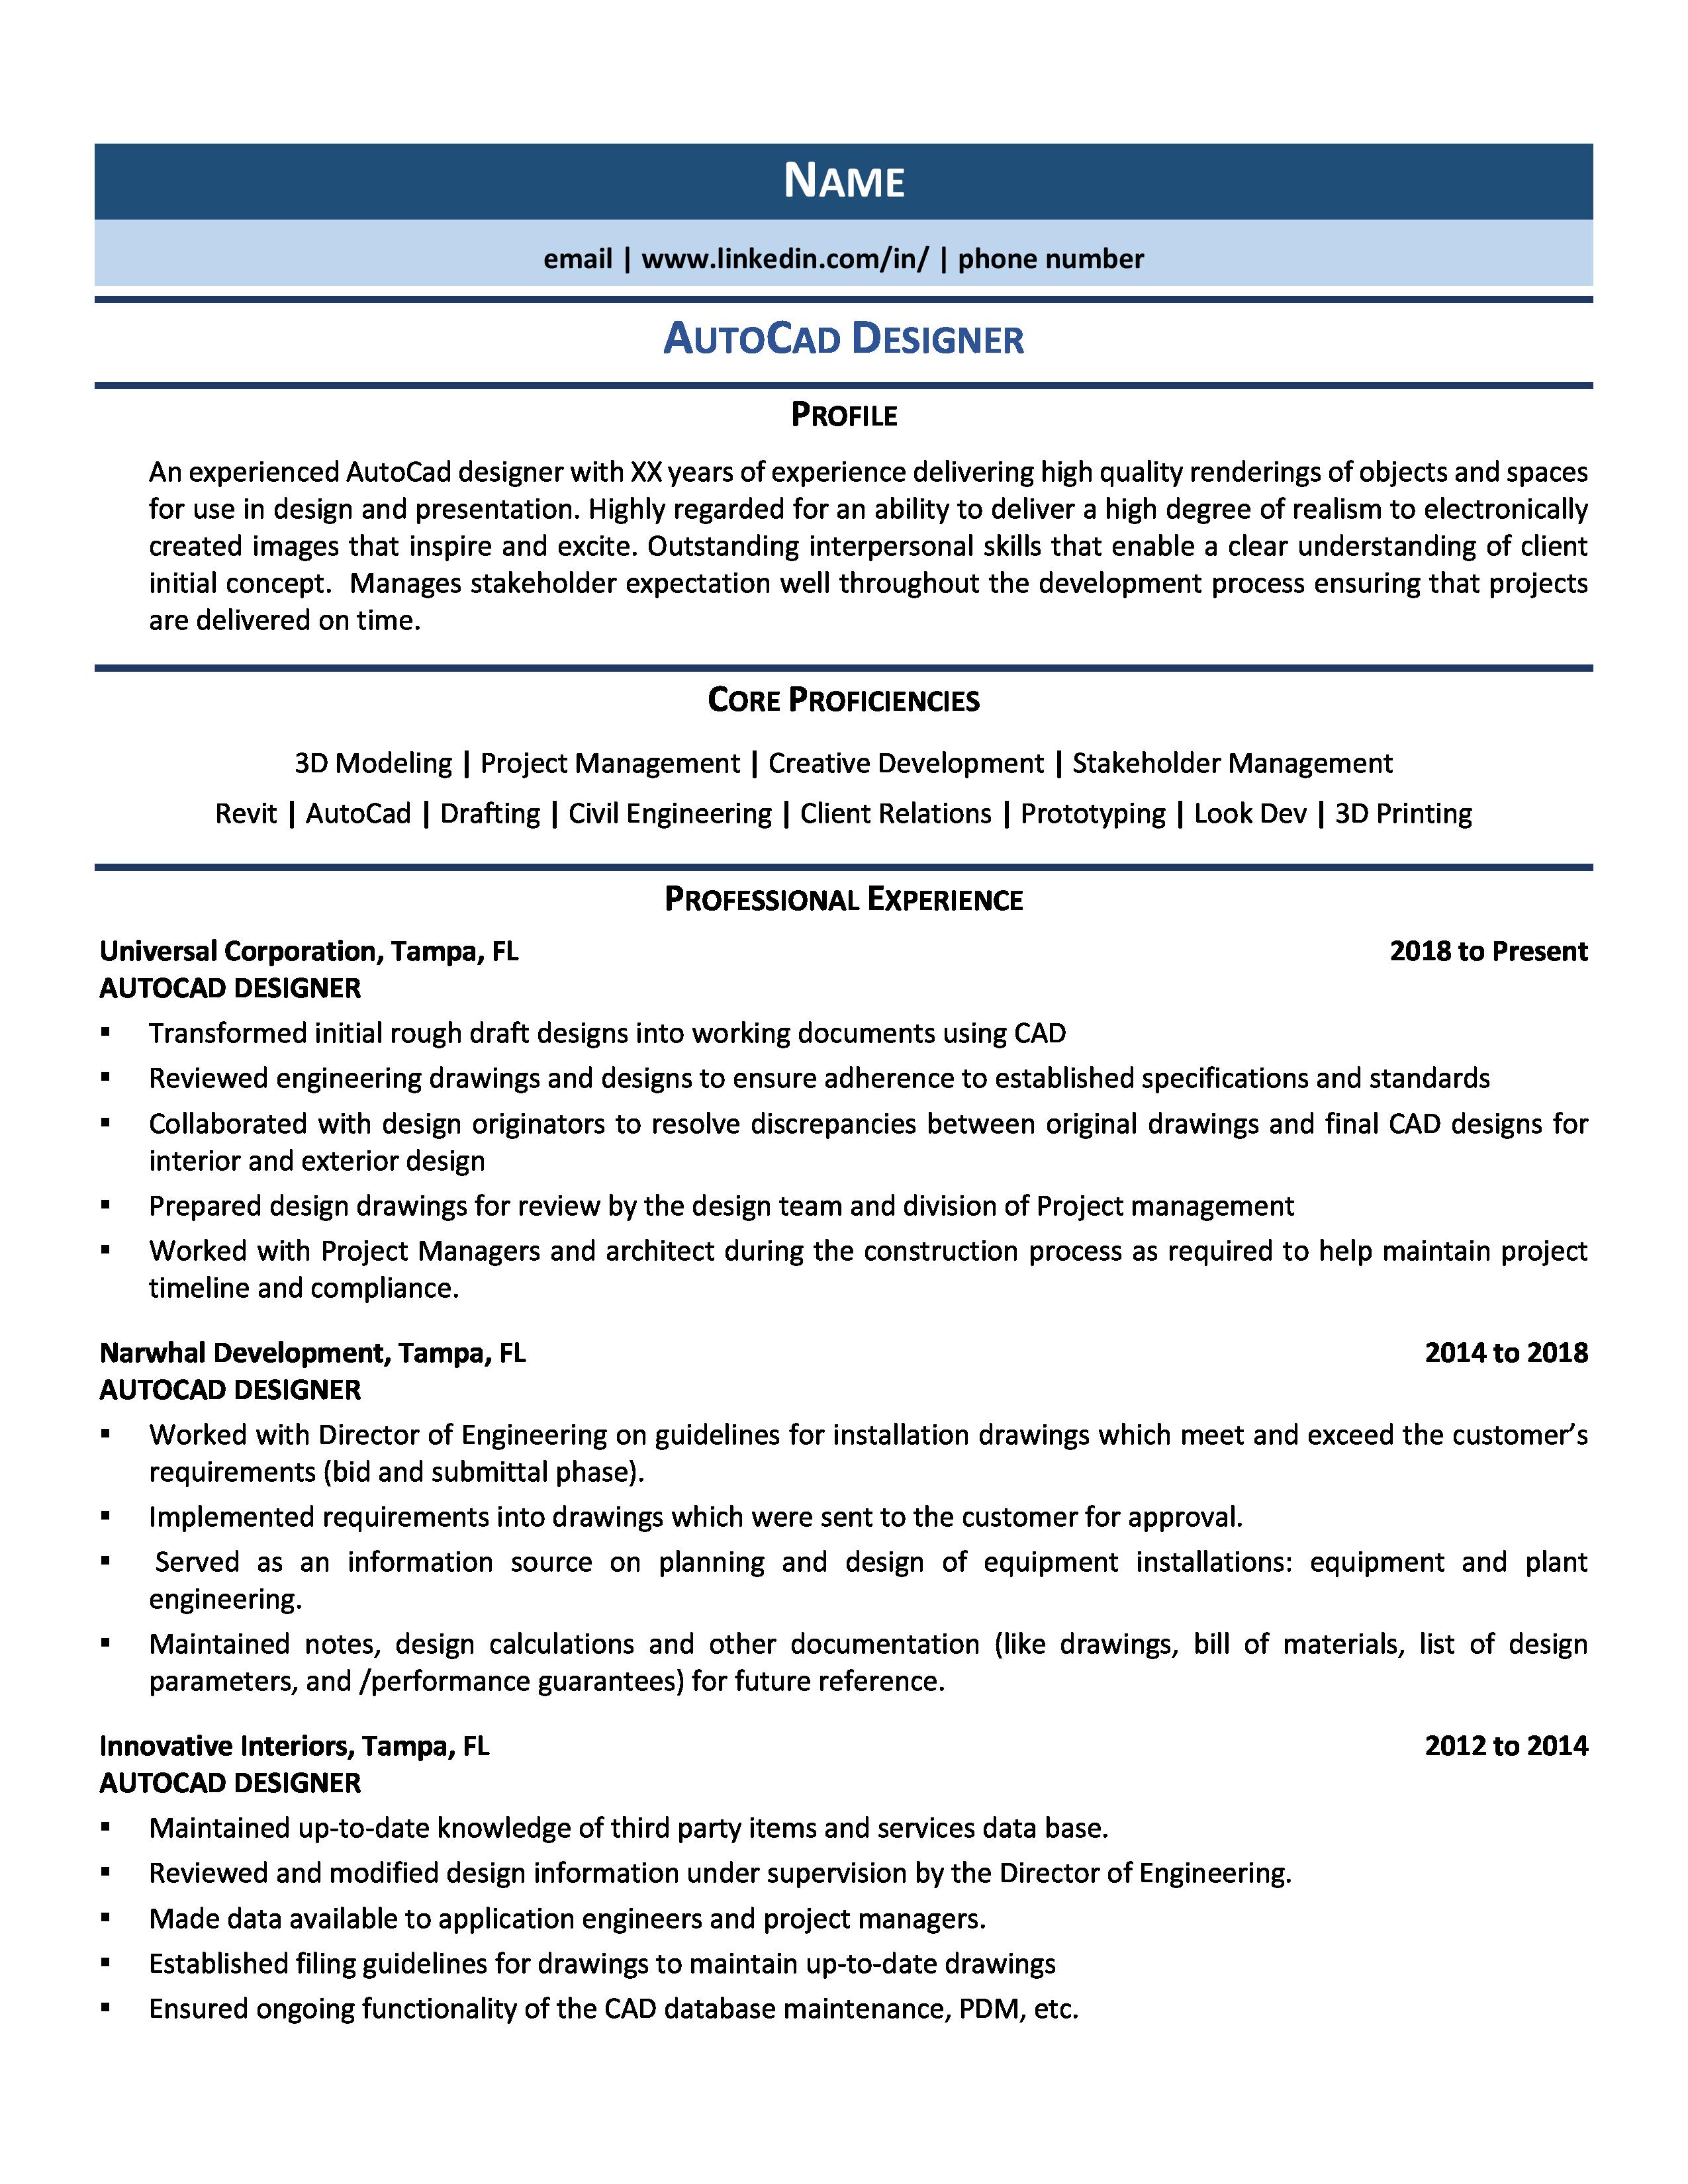 Autocad Designer Resume Samples Examples For 2020 Resume Design Resume Examples Professional Resume Examples